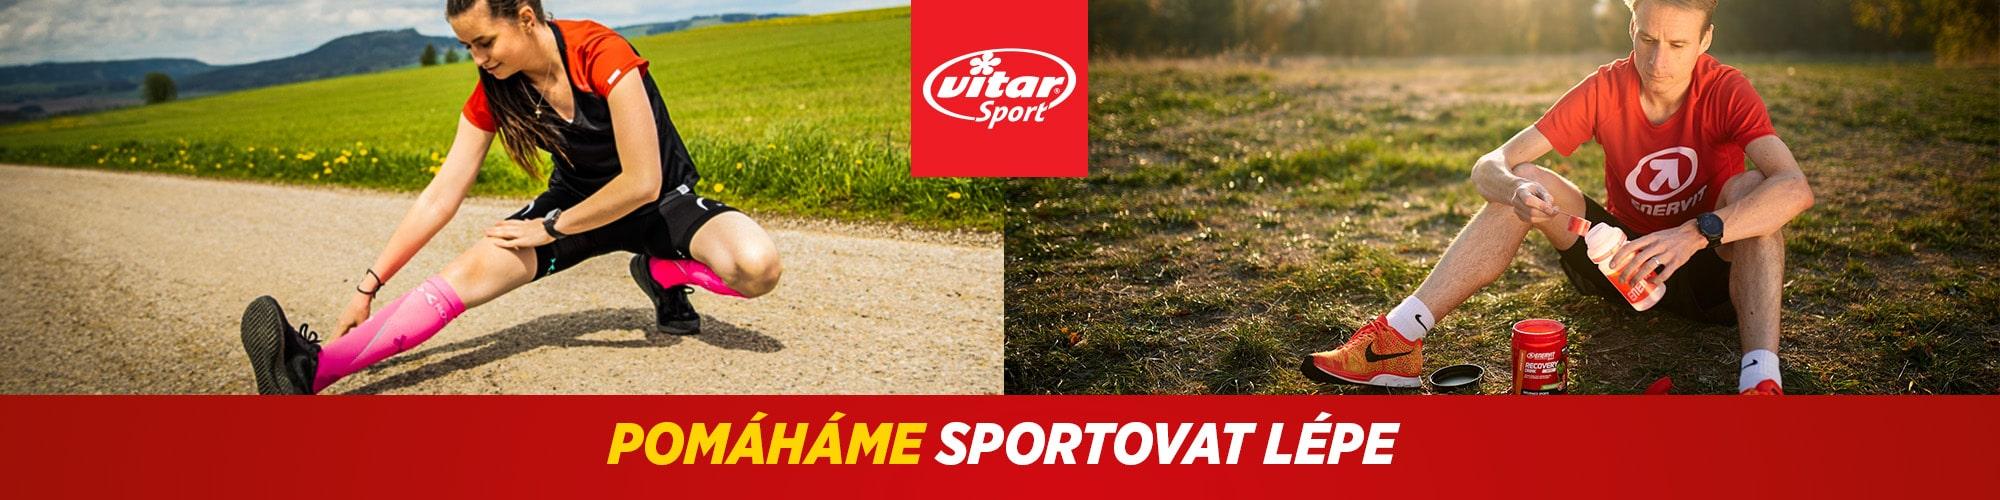 VITAR Sport